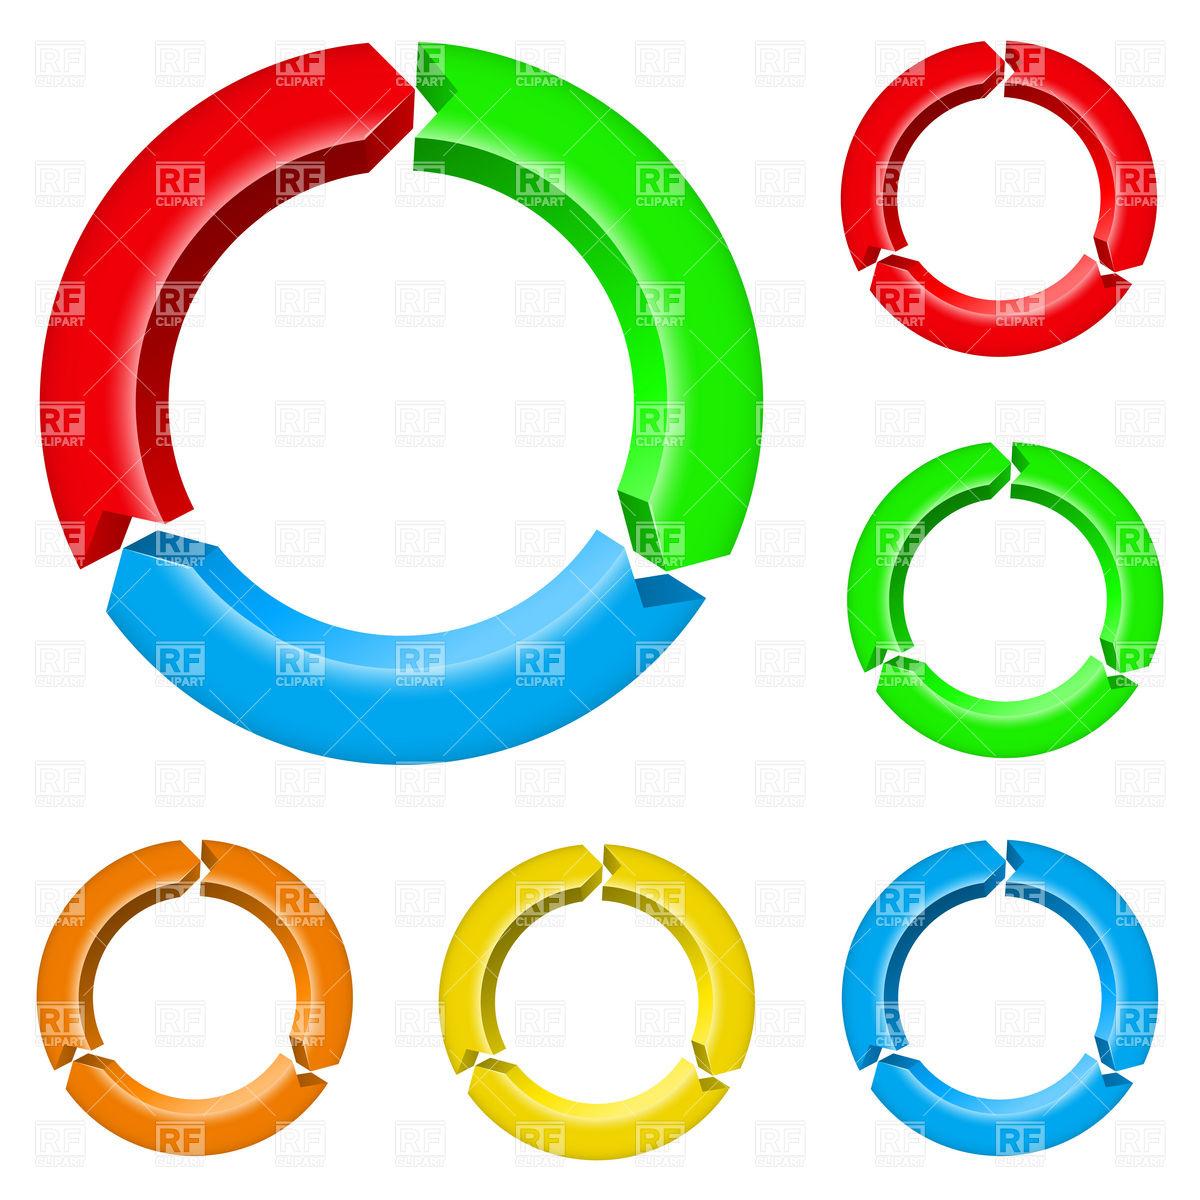 Three parts arrow circles Vector Image #7463.